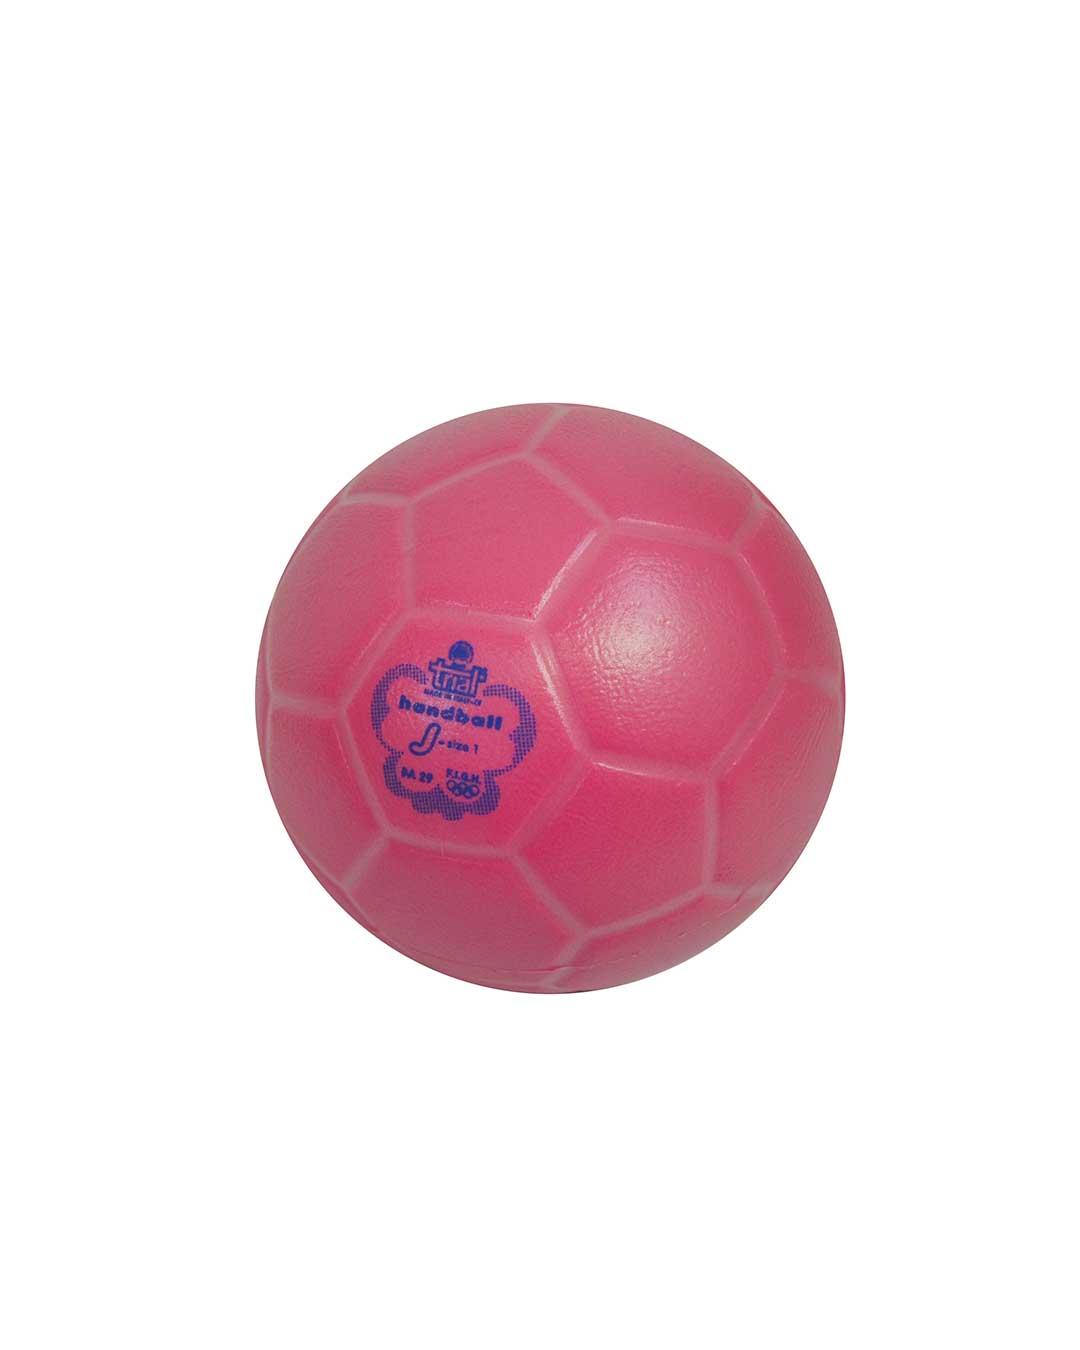 Balón de Handball Marca Trial BA 29 J No.1 rosado